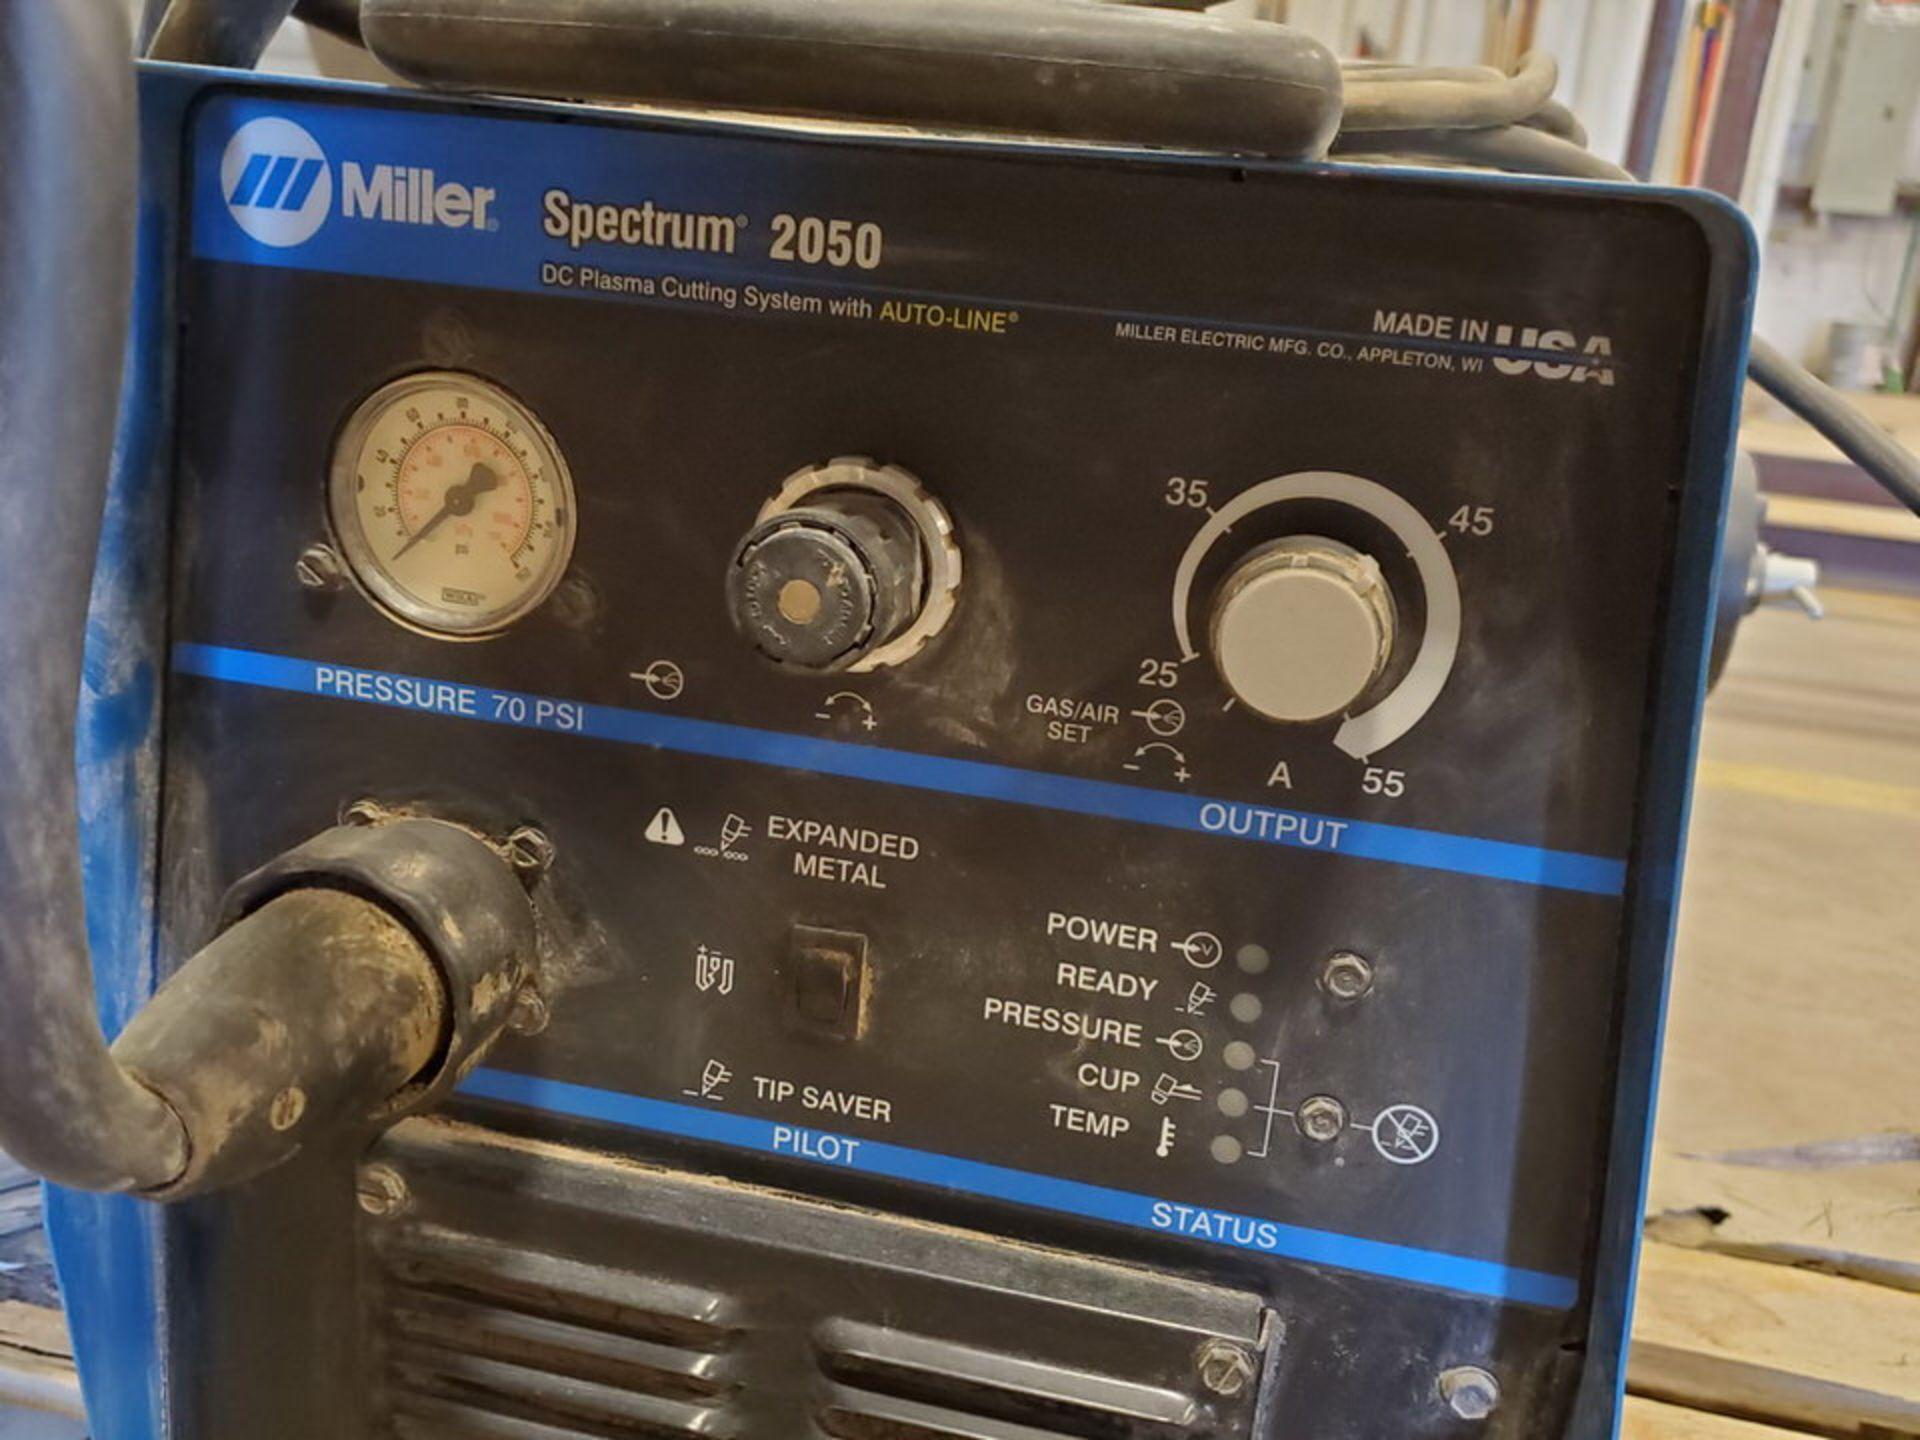 Miller Spectrum 2050 Plasma Cutter 208-575V, 50/60HZ, 3PH - Image 5 of 6